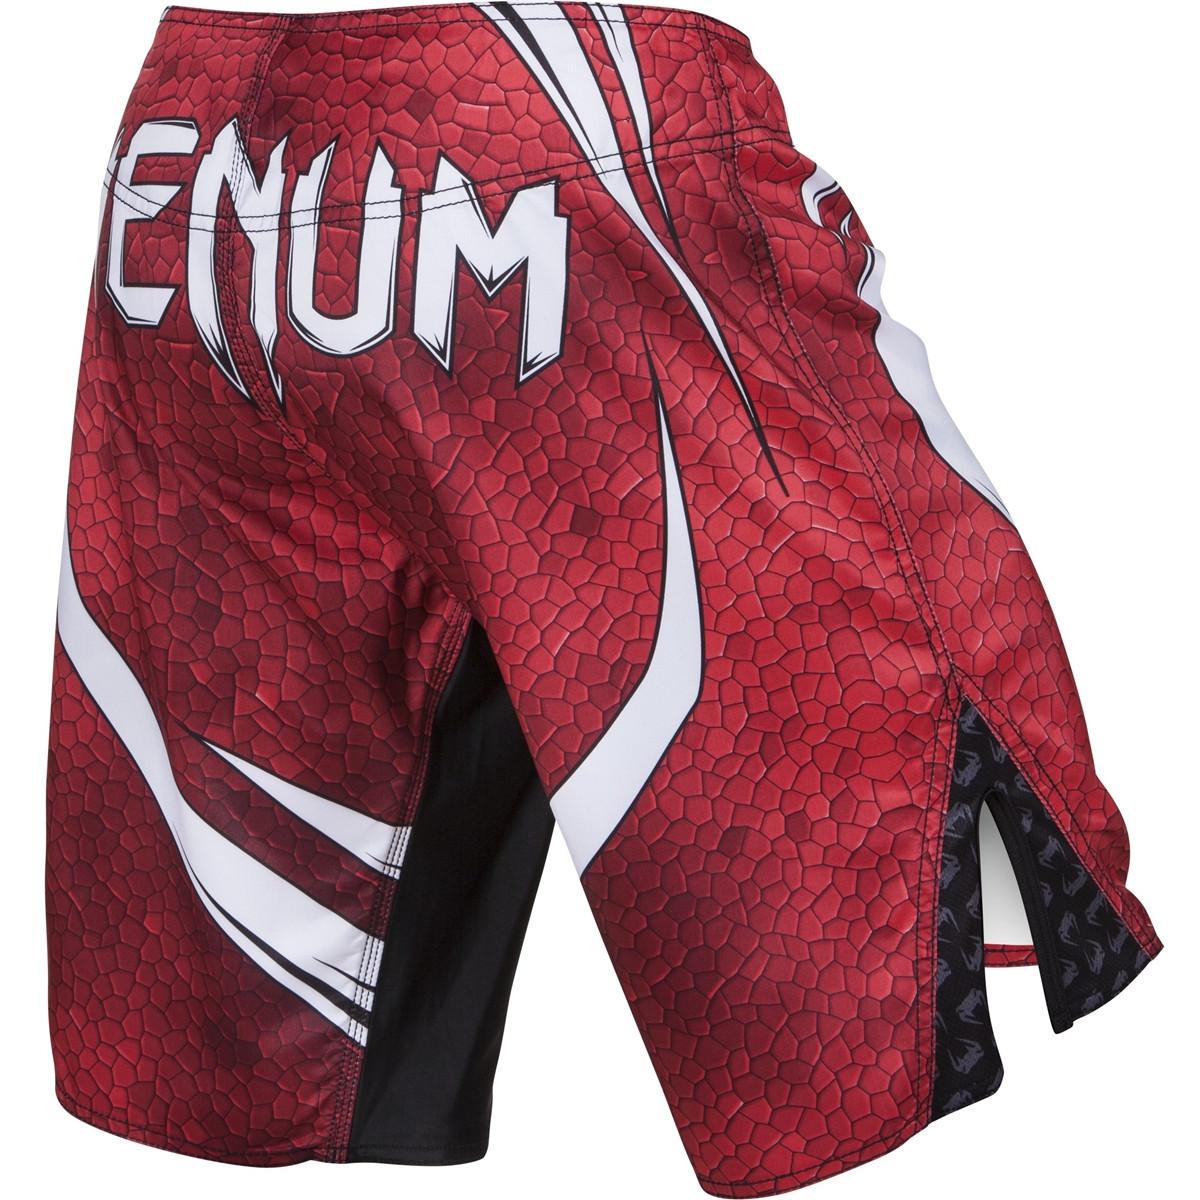 b48283dbfe Venum Amazonia 4.0 Fight Shorts - Red